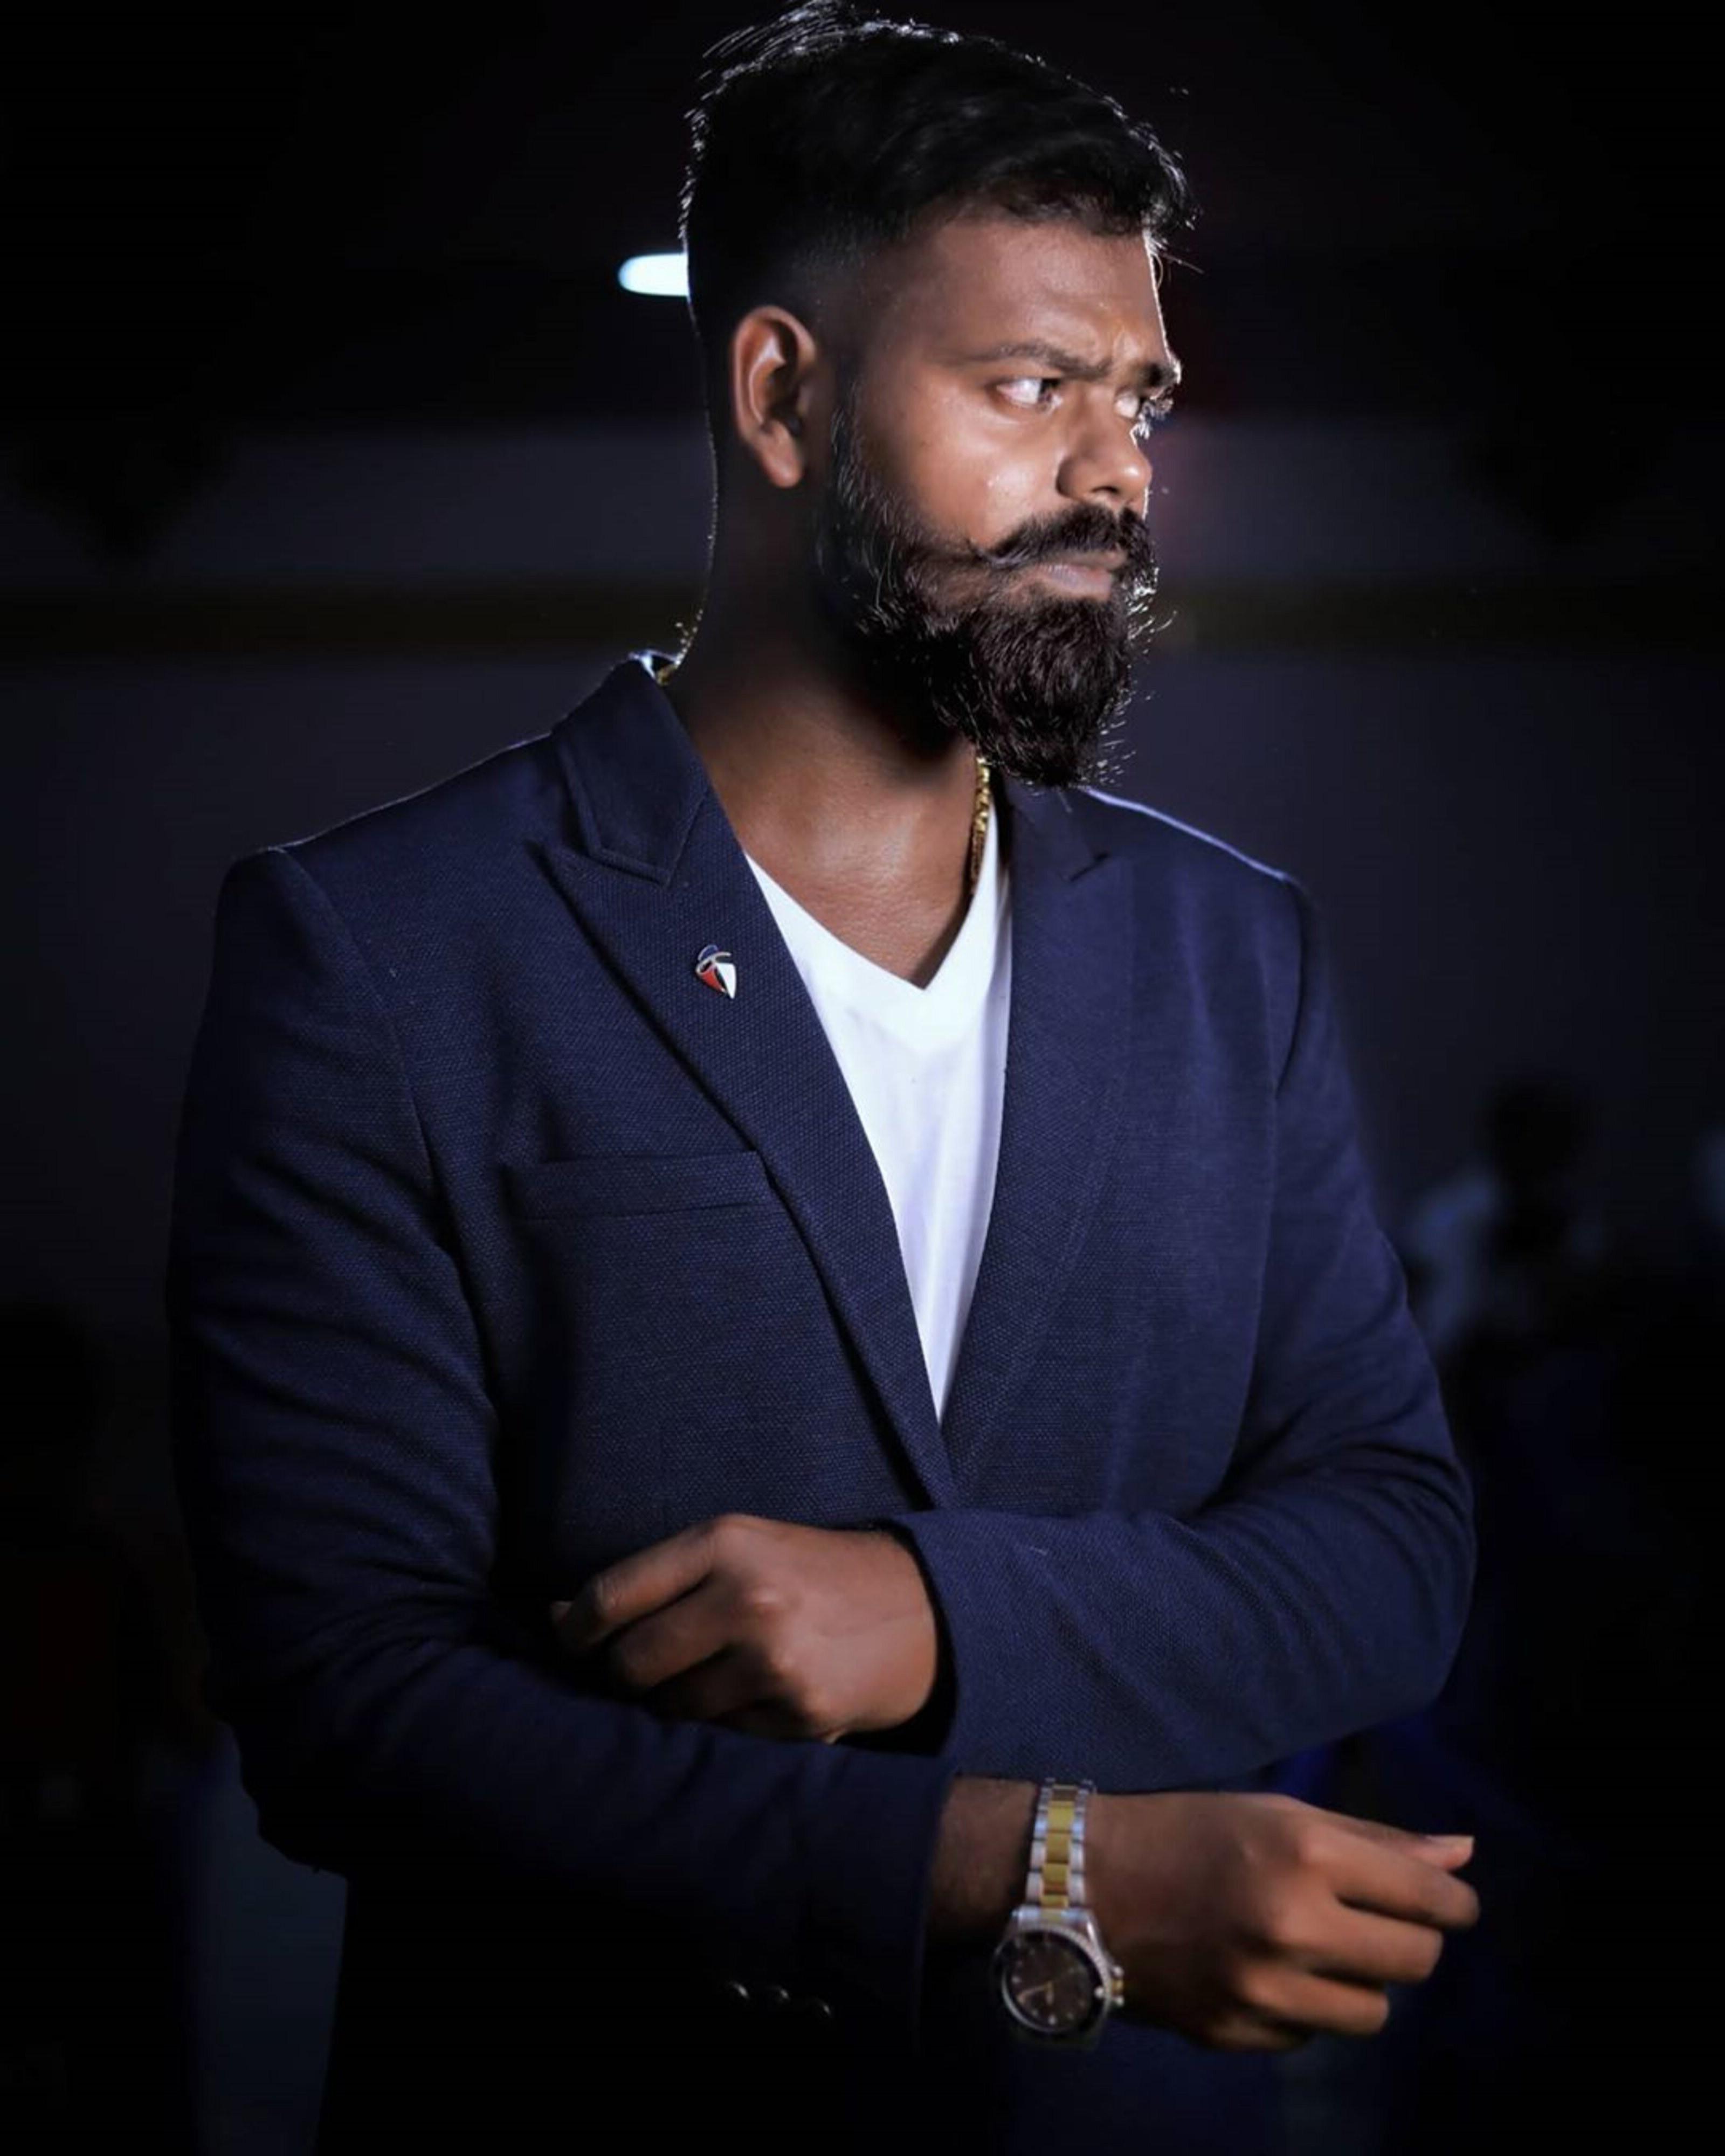 Cool African American handlebar mustache.